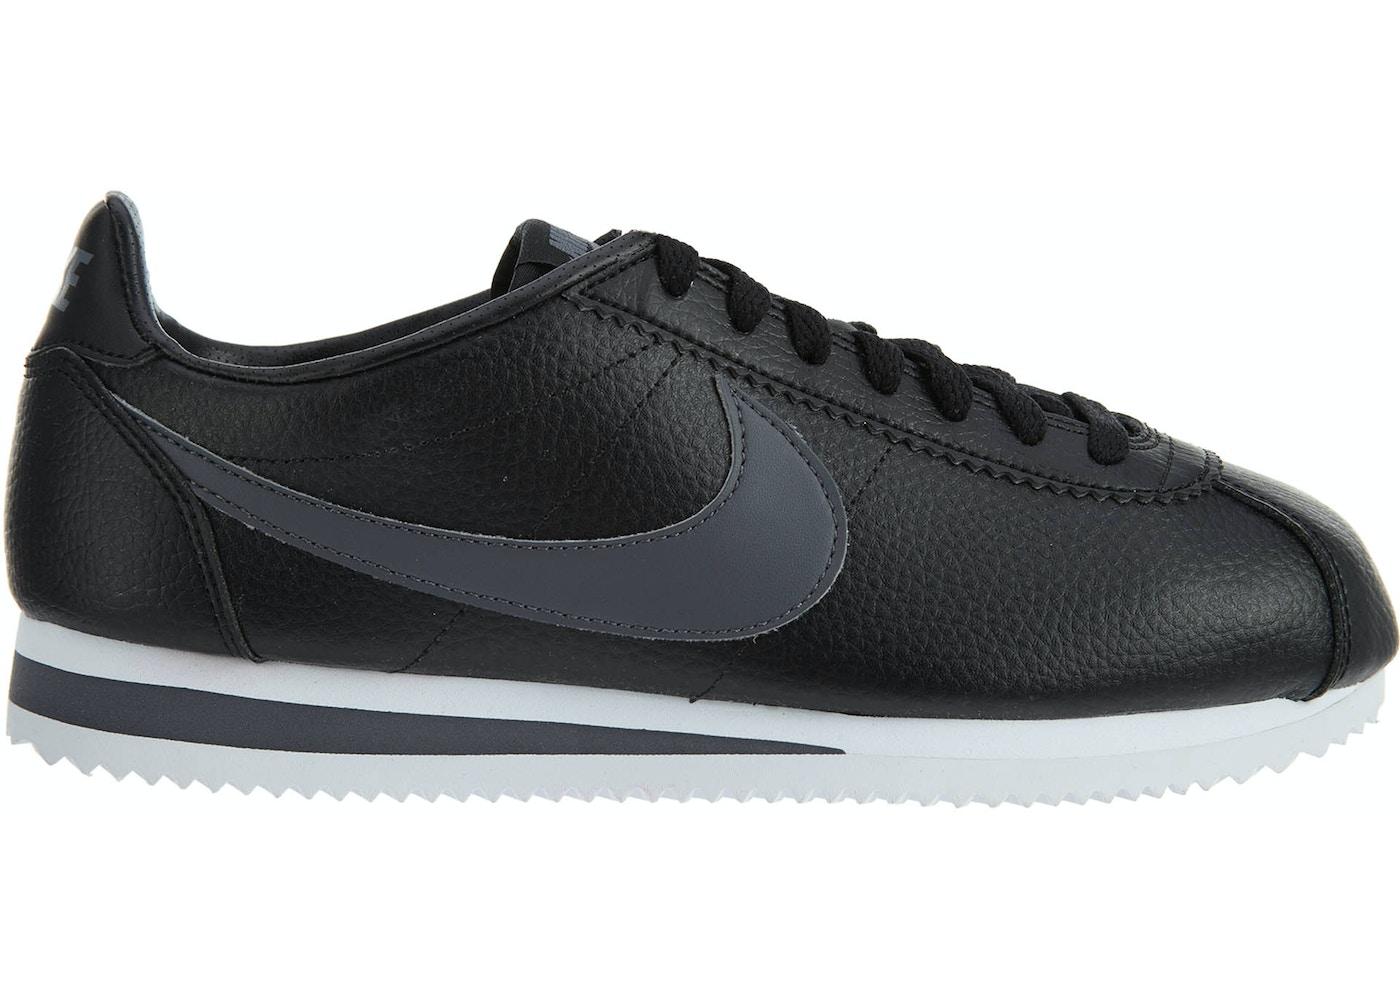 new arrival 492c9 82555 Nike Classic Cortez Leather BlackDark Grey-White